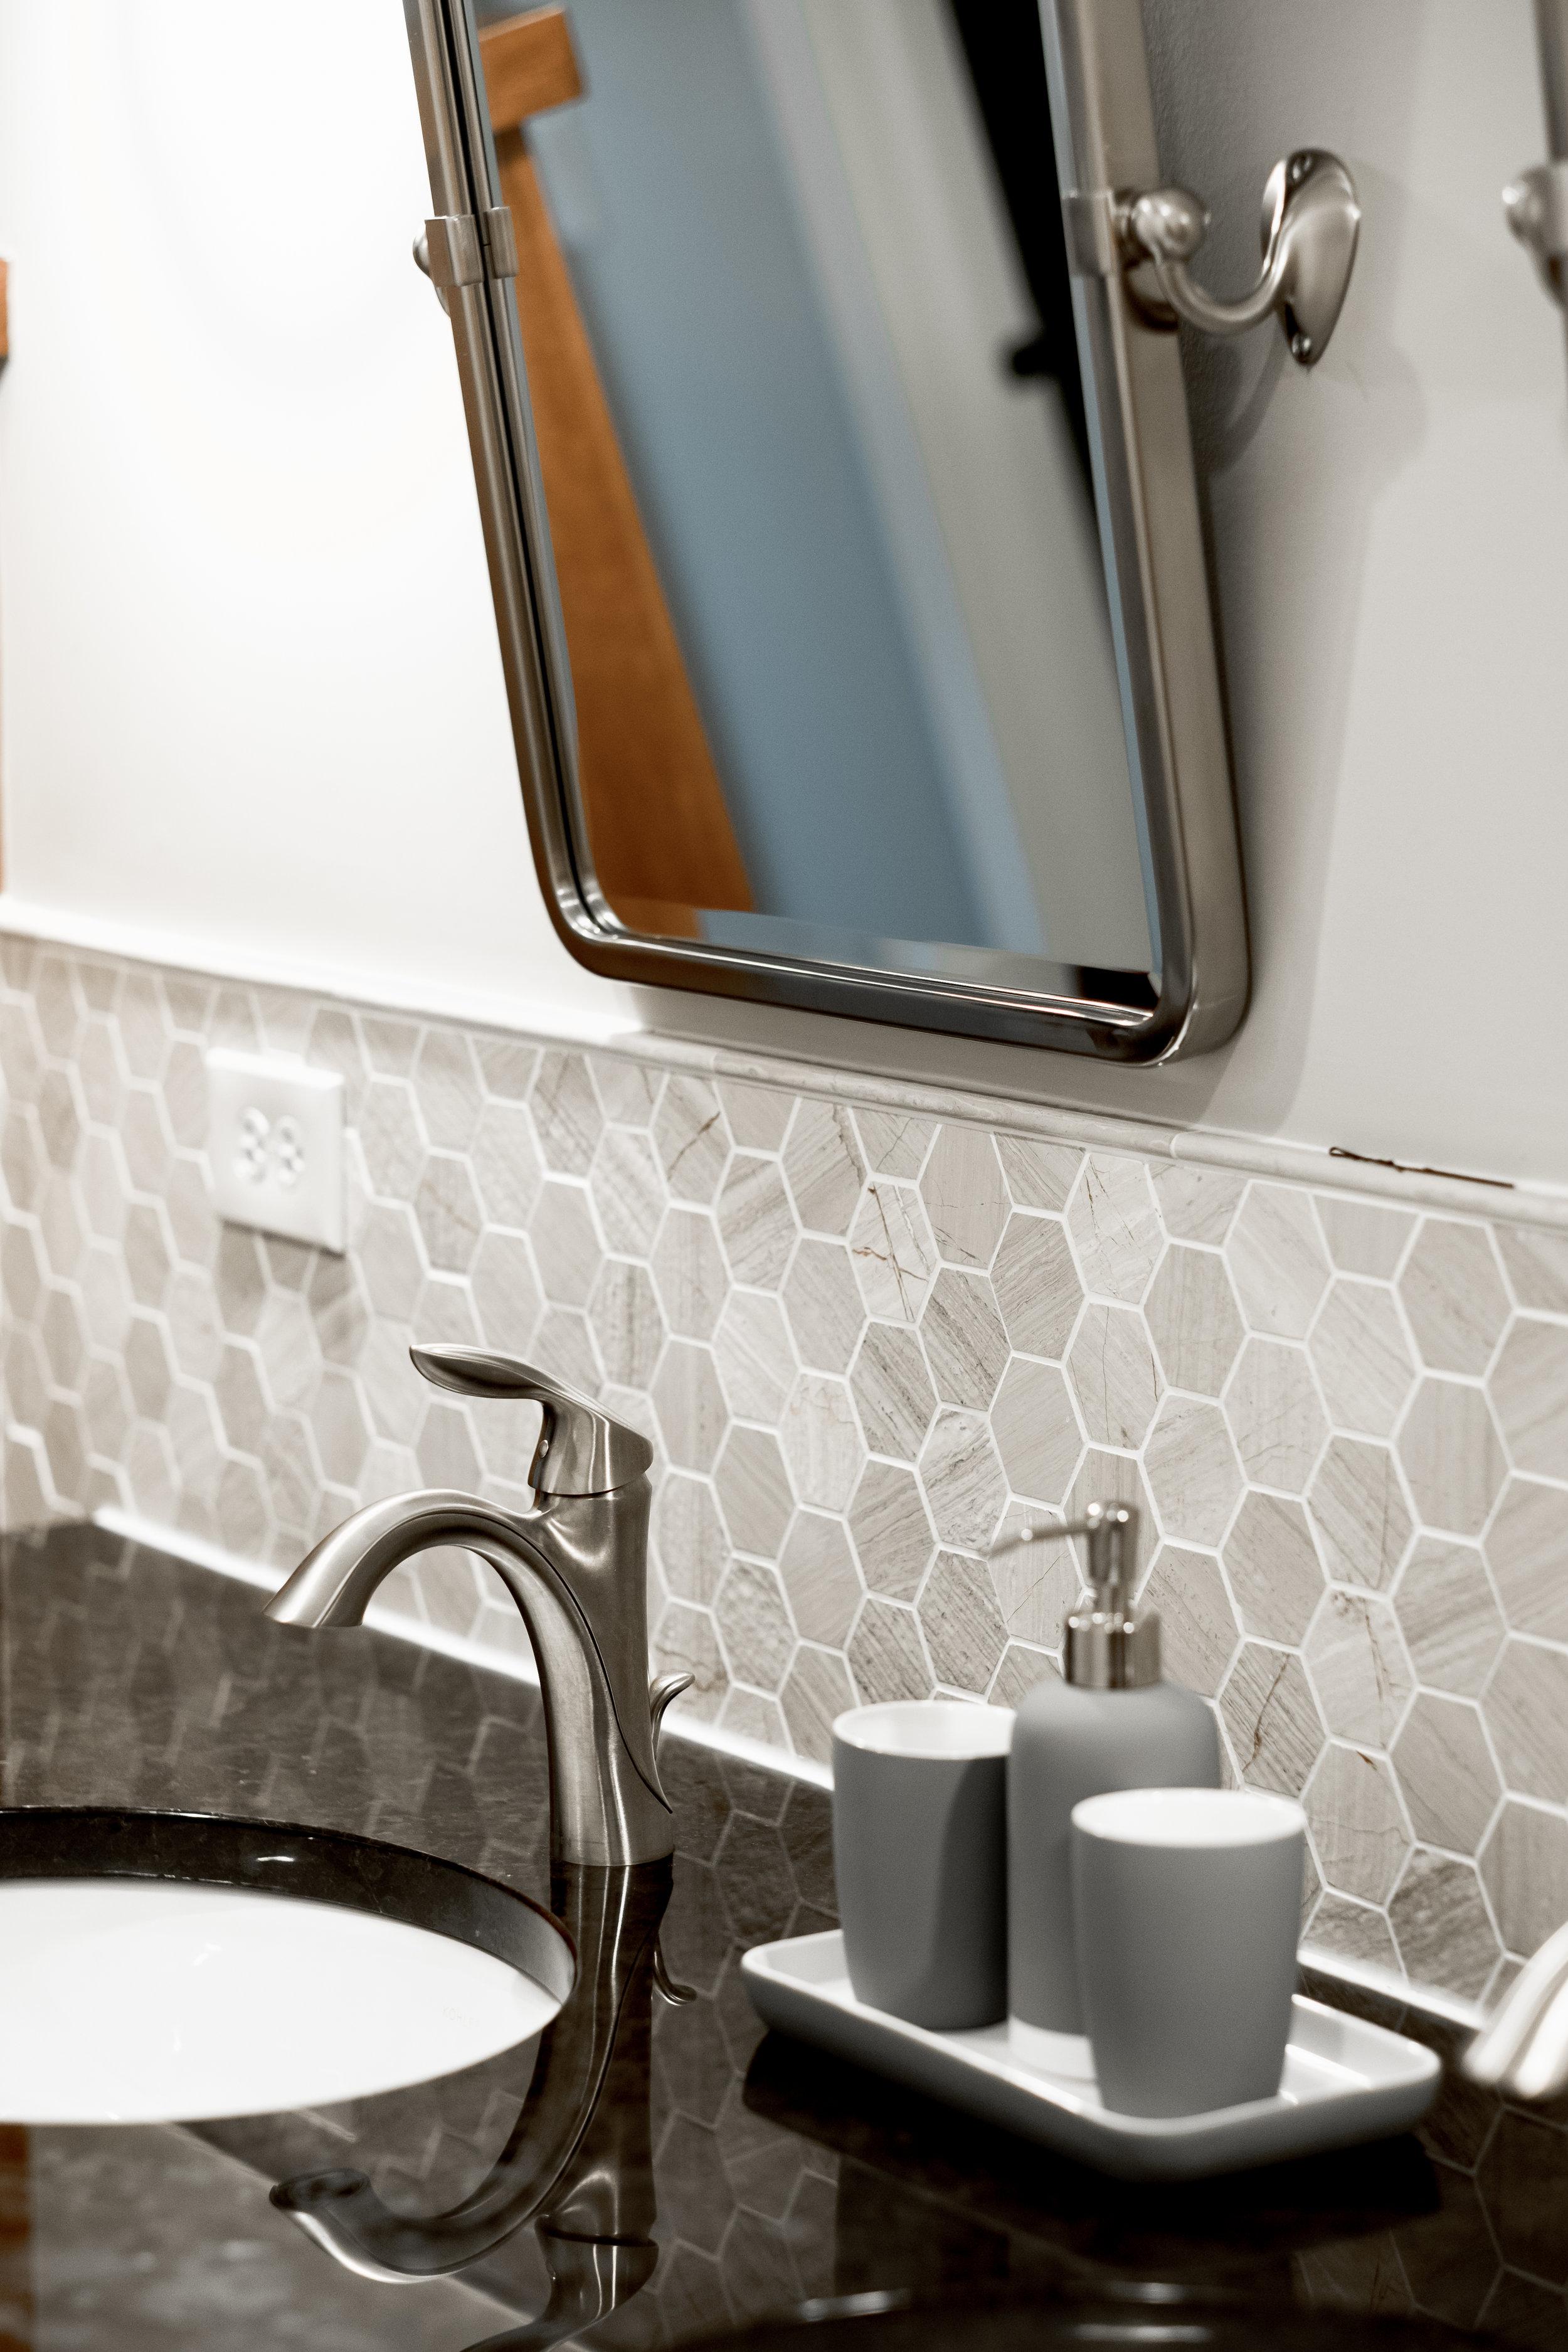 Hexagon tile in bathroom